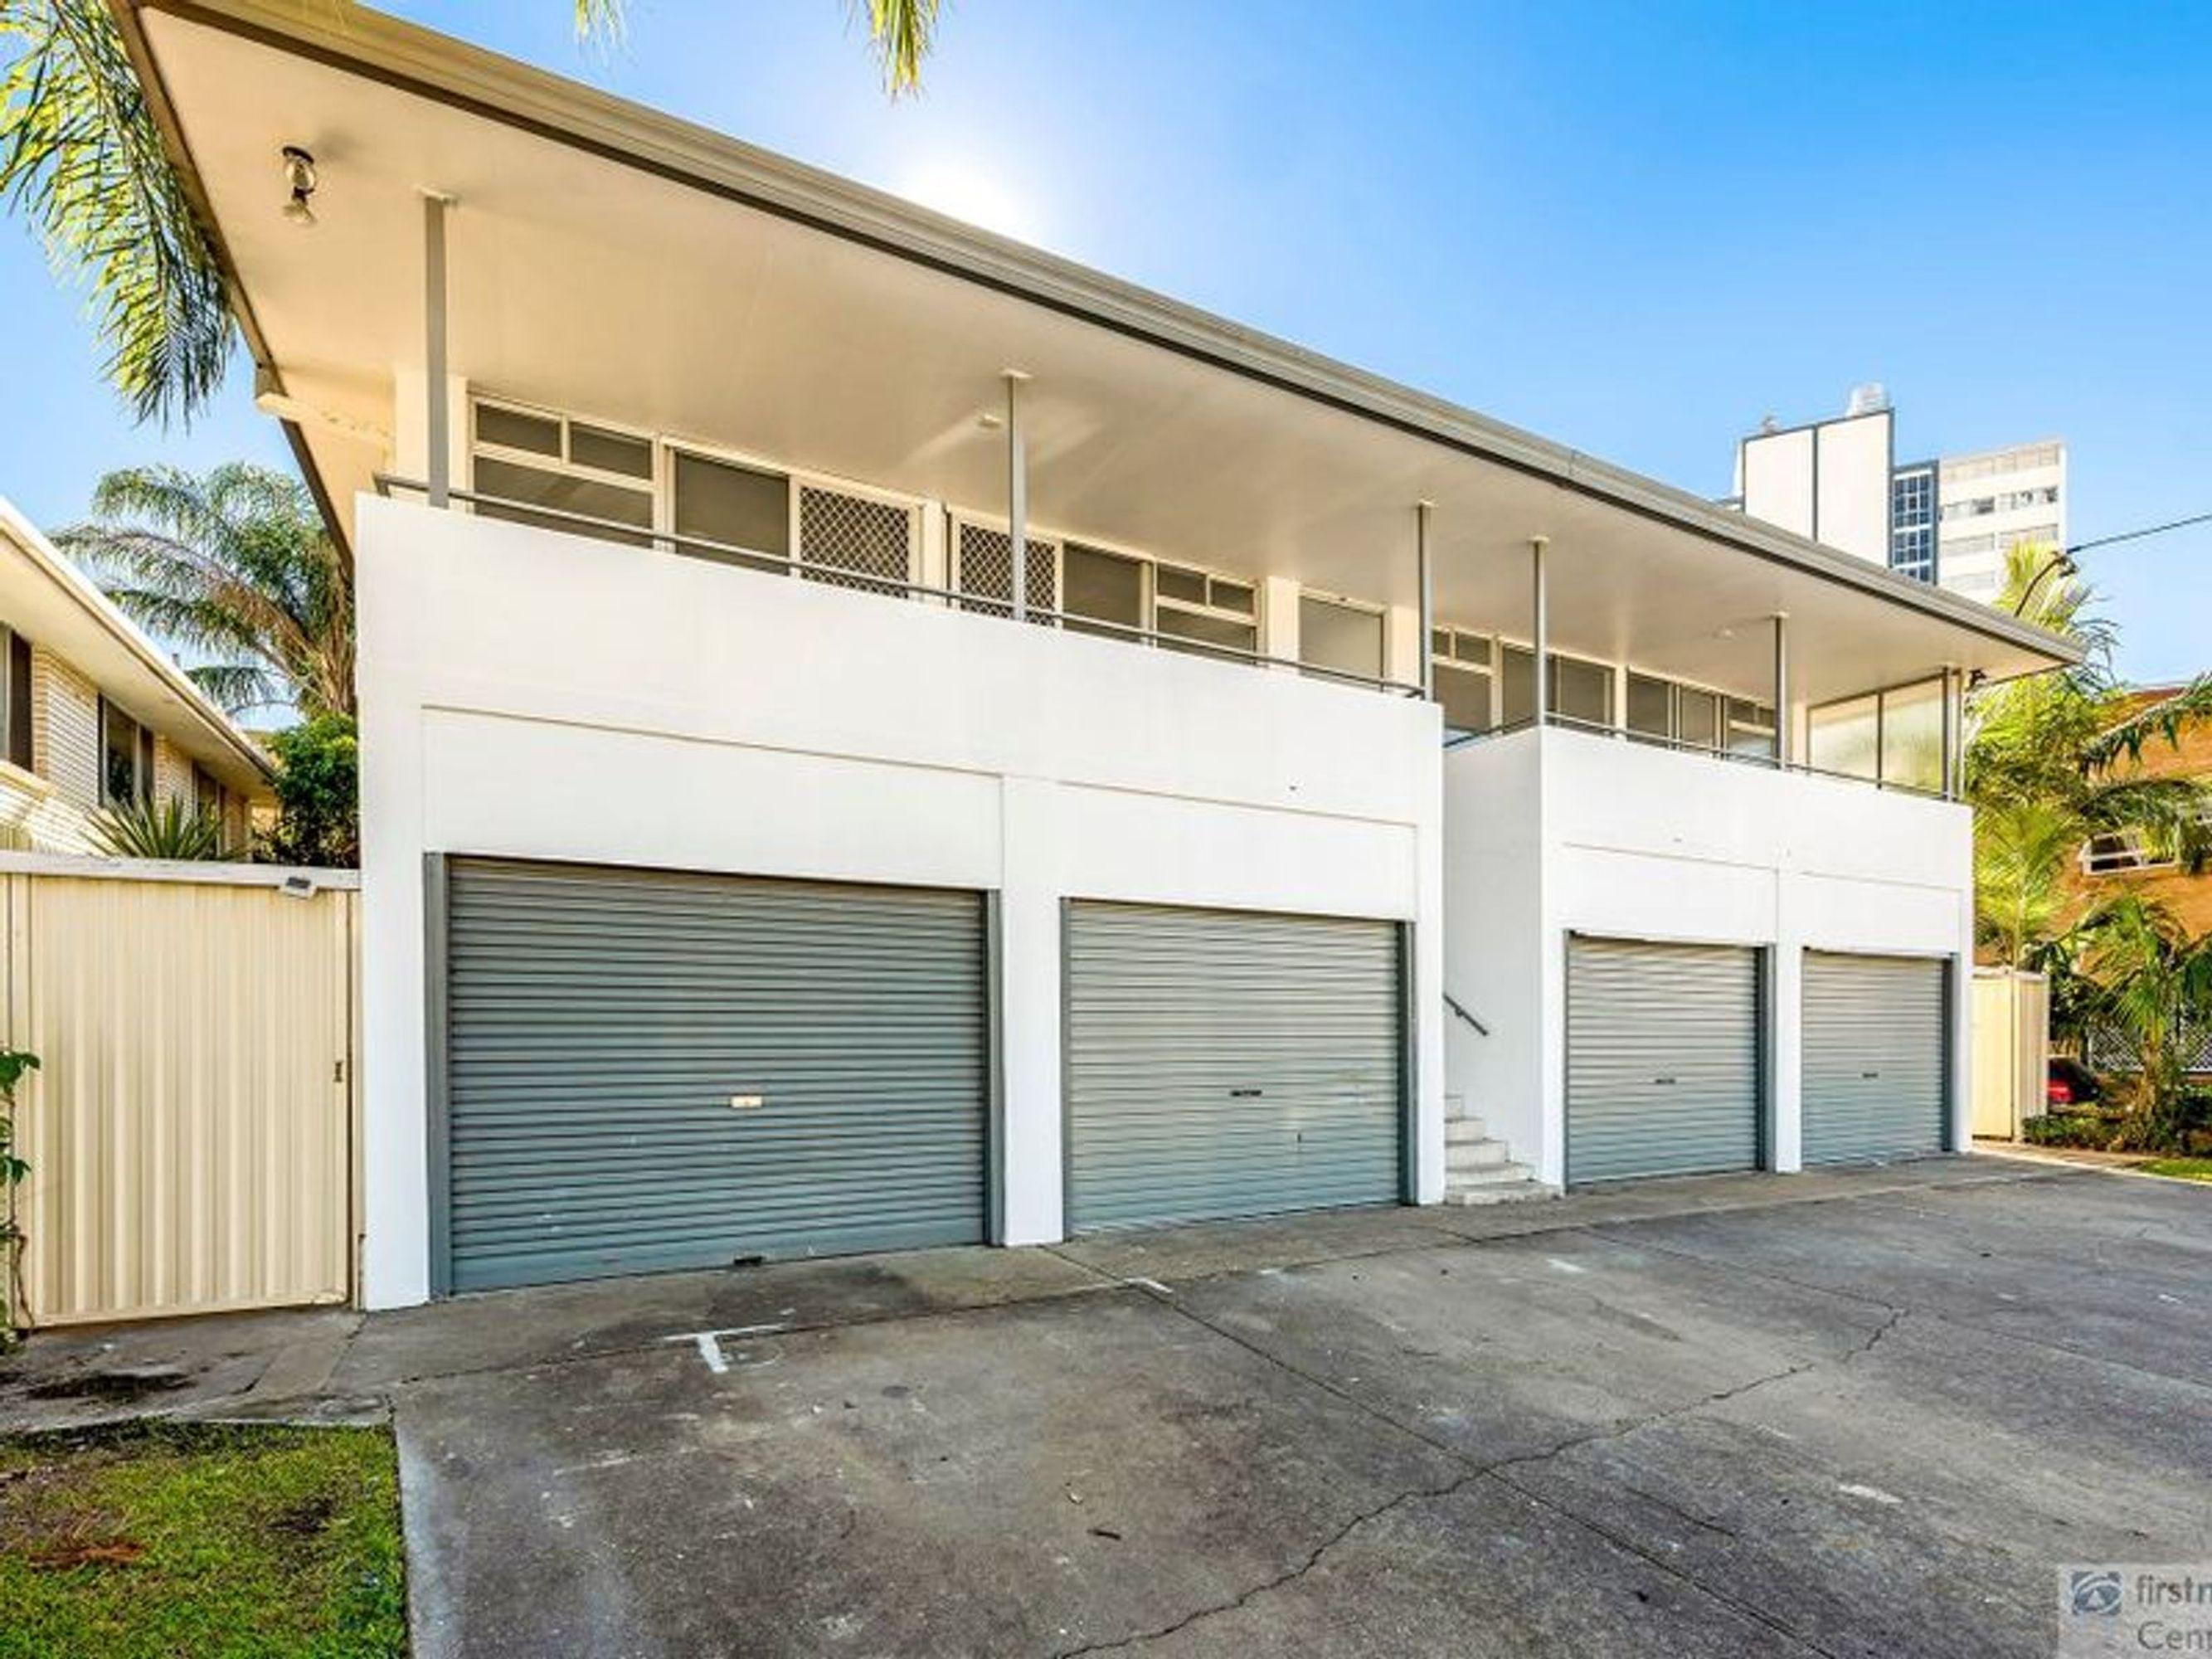 1/34 Leonard Avenue, Surfers Paradise, QLD 4217